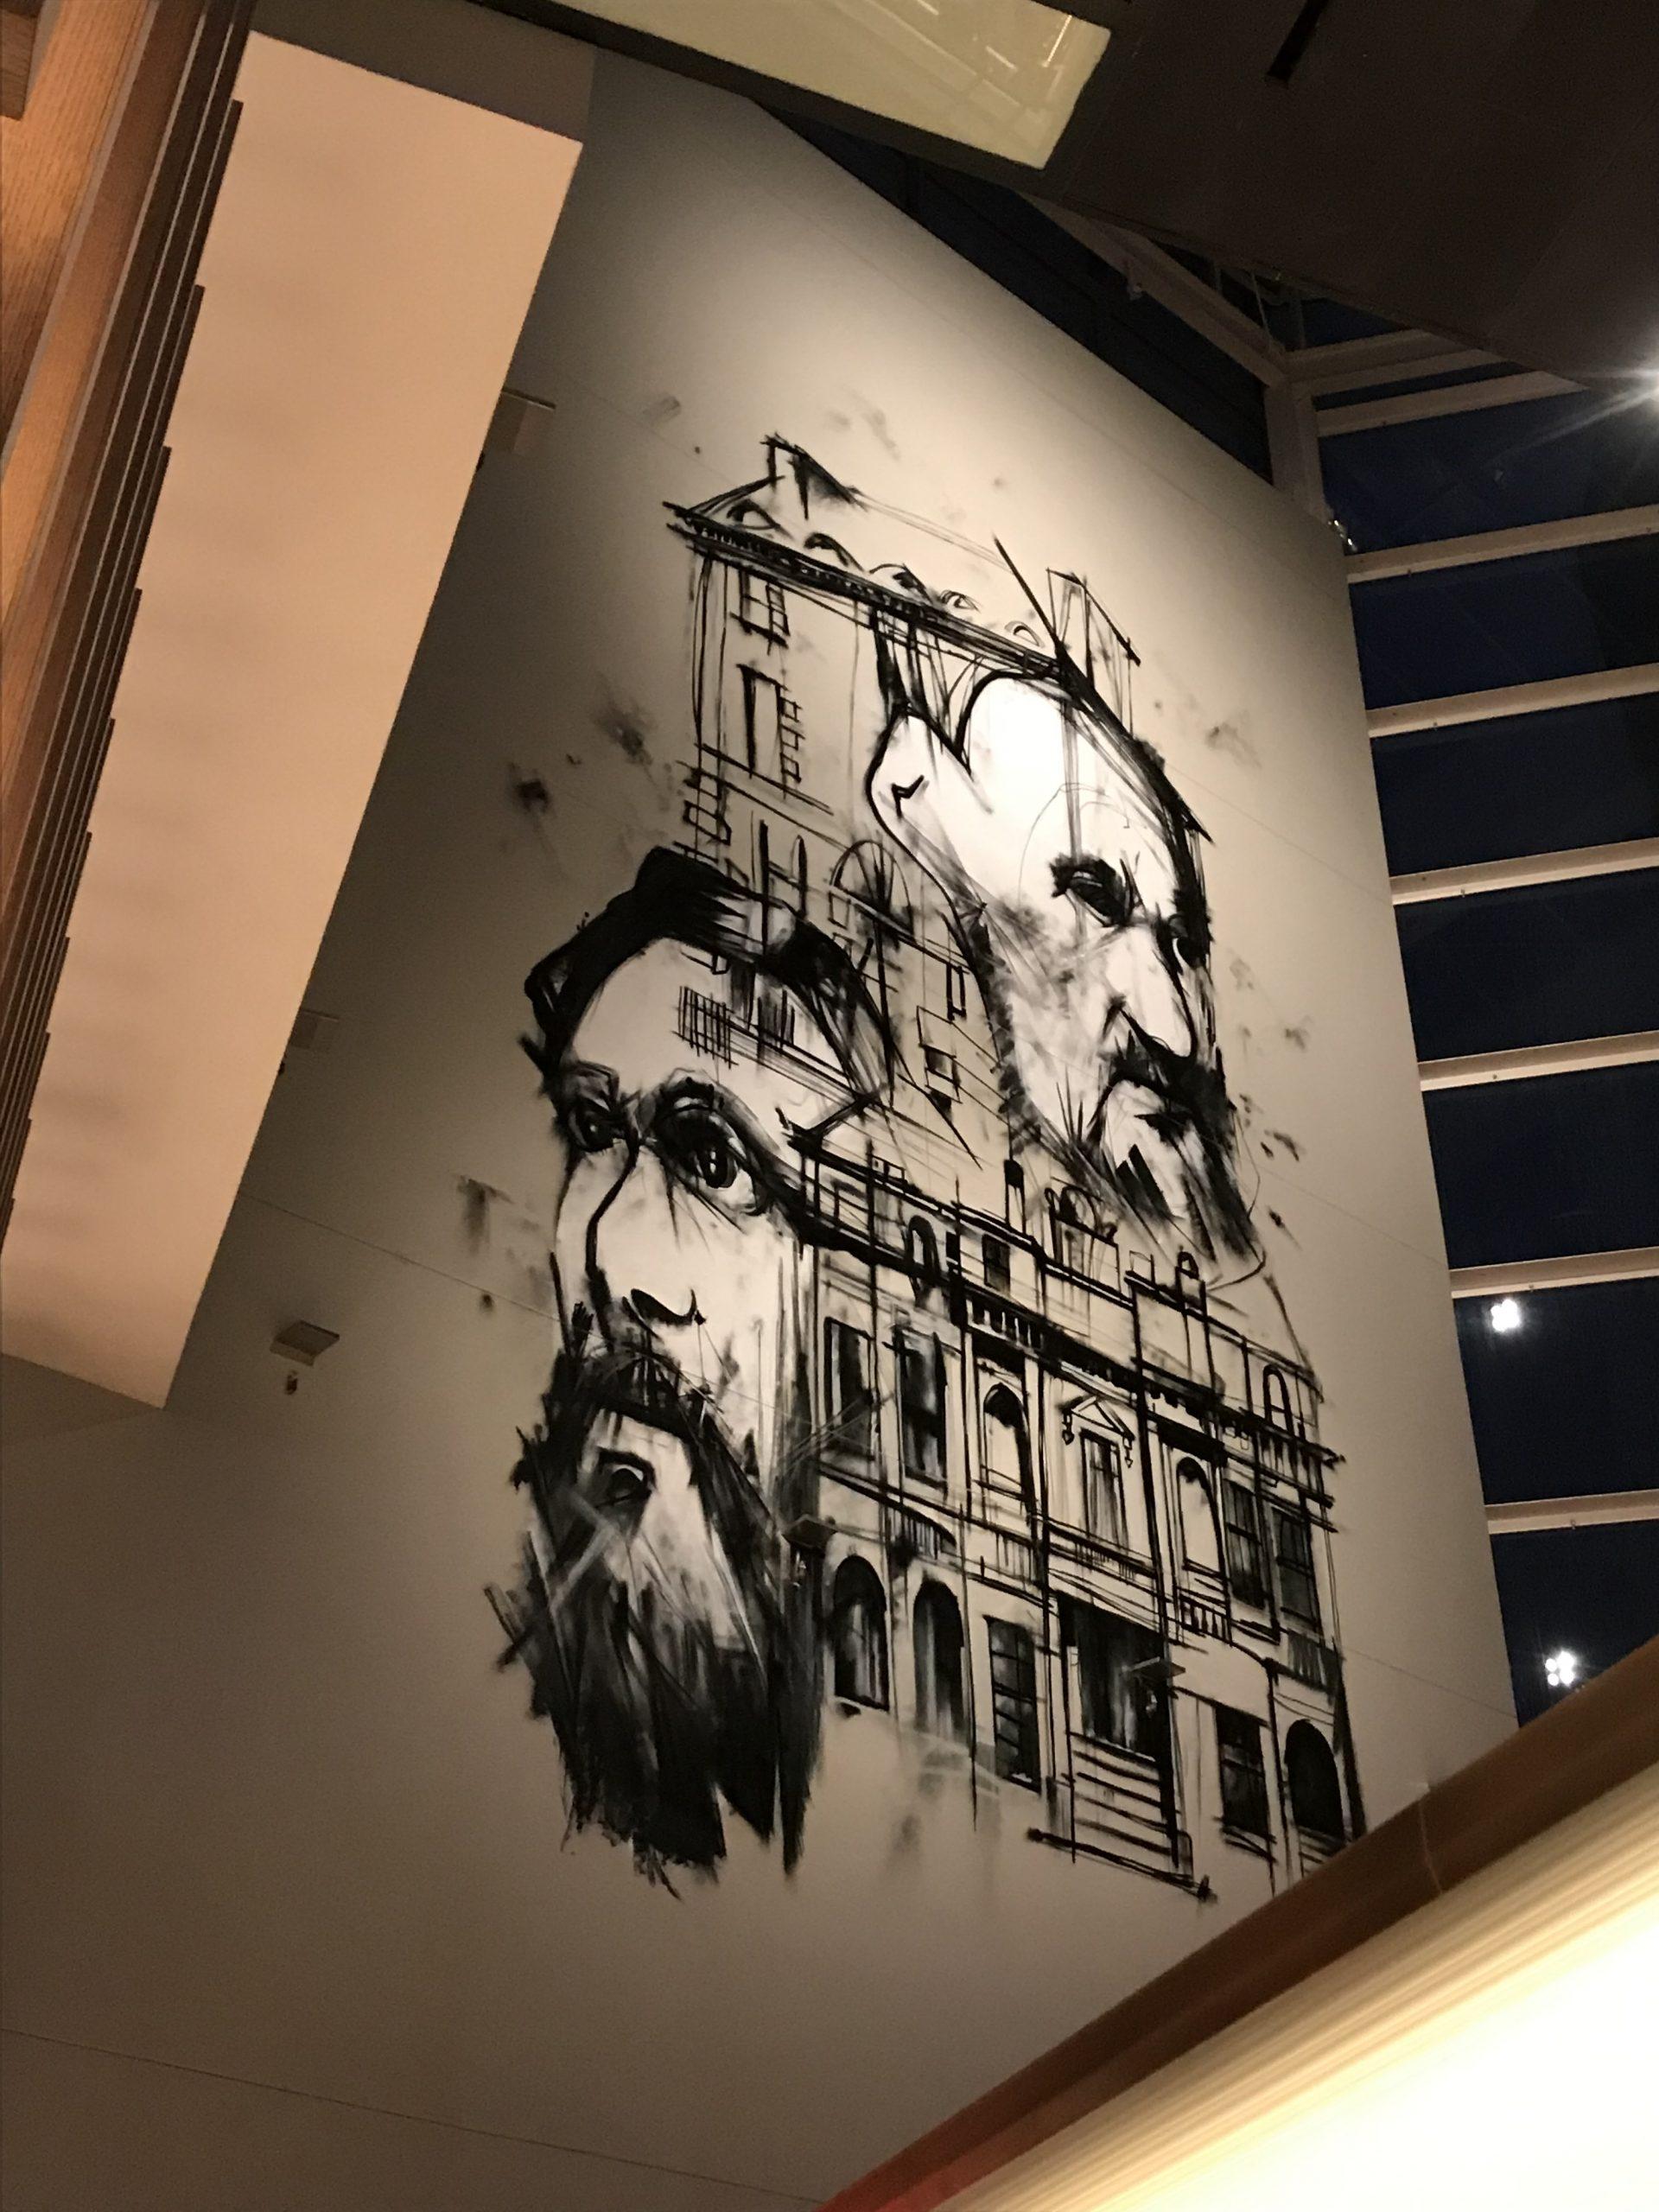 Radisson Blu Glasgow art